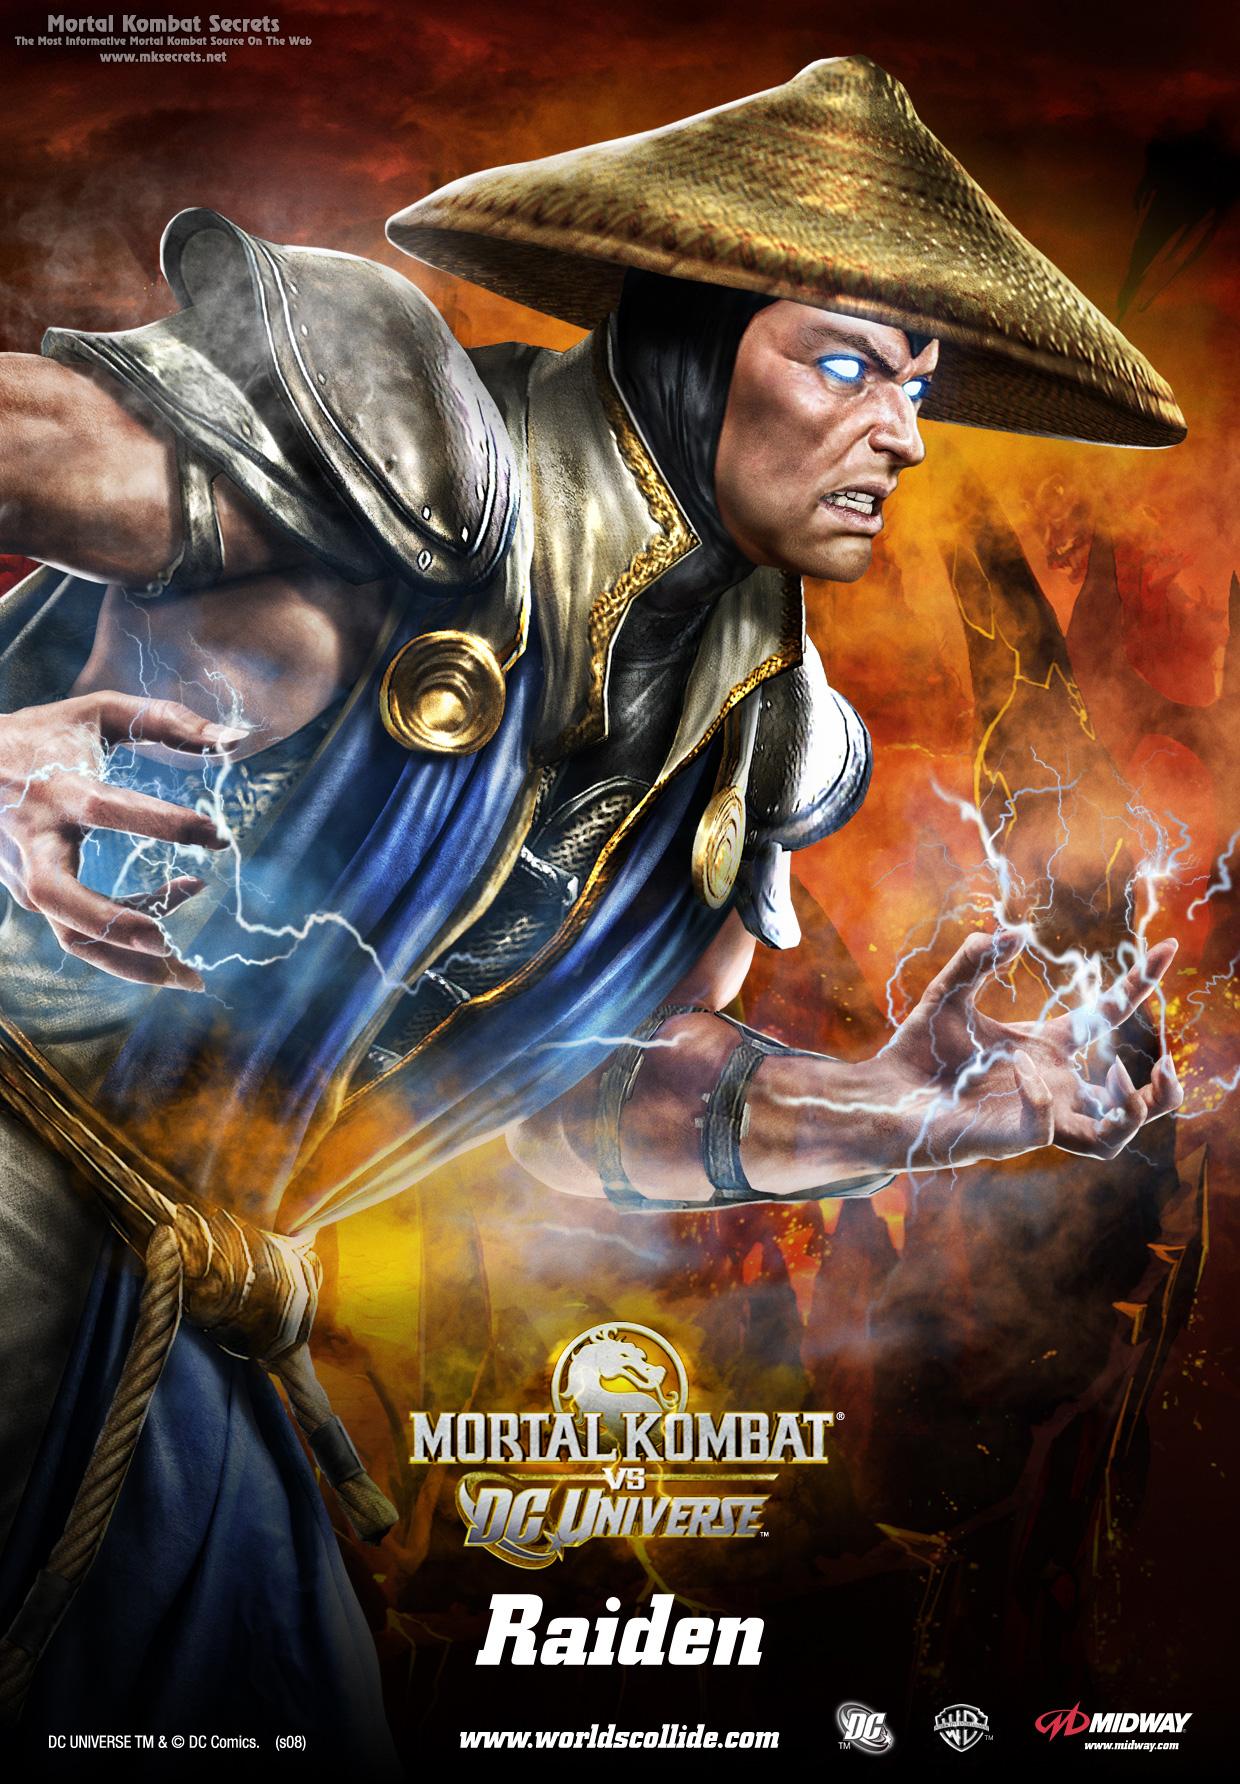 Mortal kombat vs dc universe posters